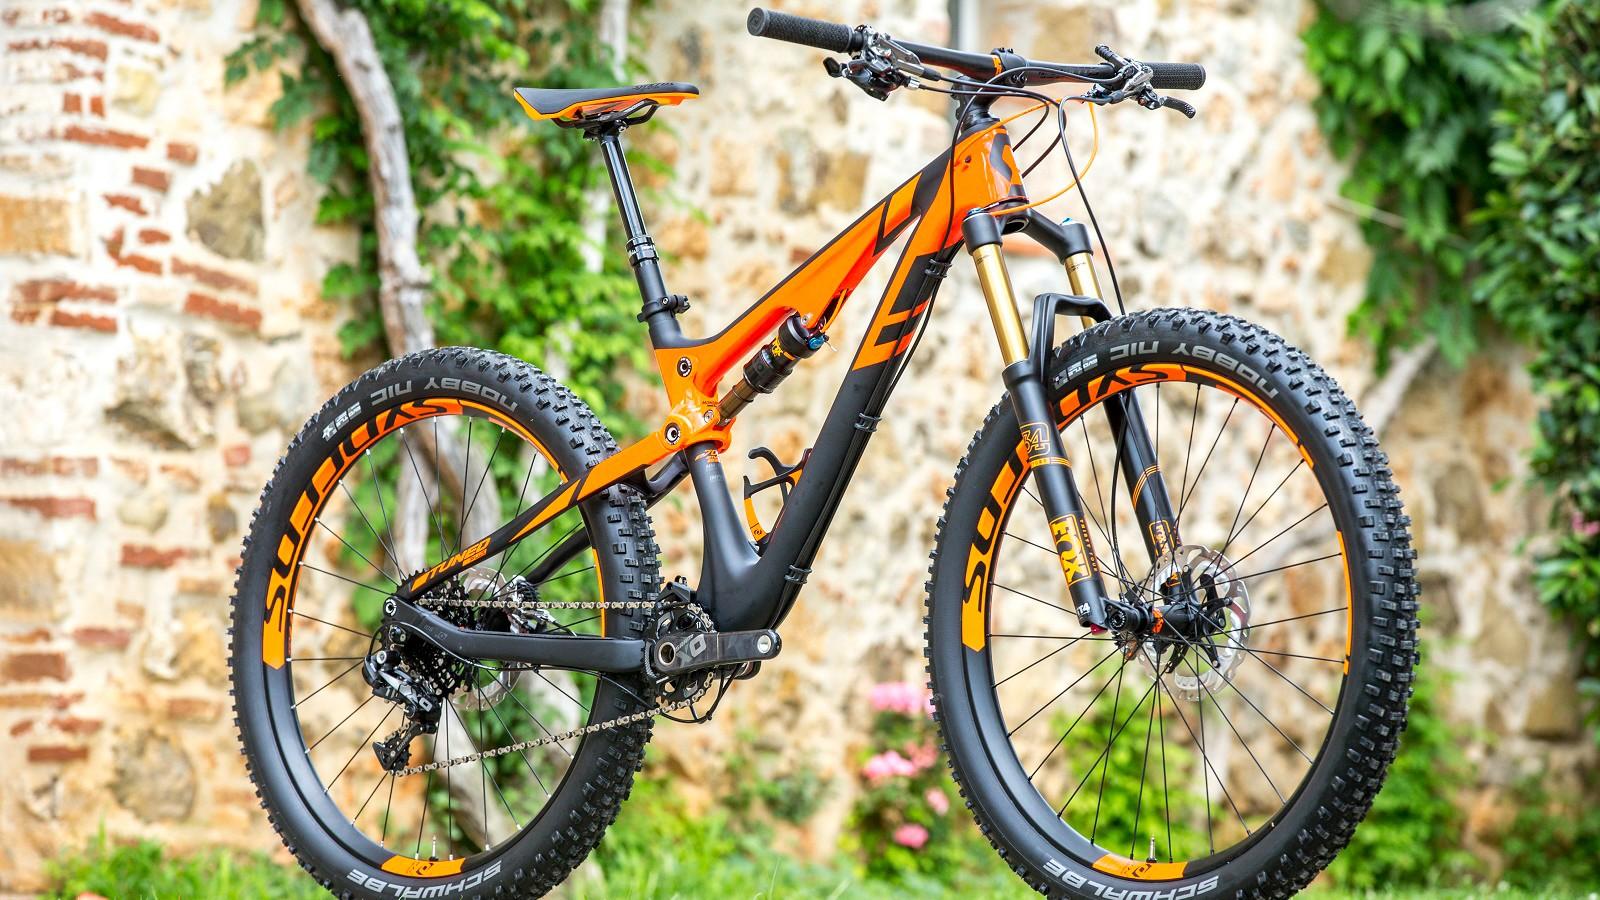 Scott's new Genius 700 Tuned Plus bike gets 40mm rims (internal width) and 2.8in Schwalbe tyres